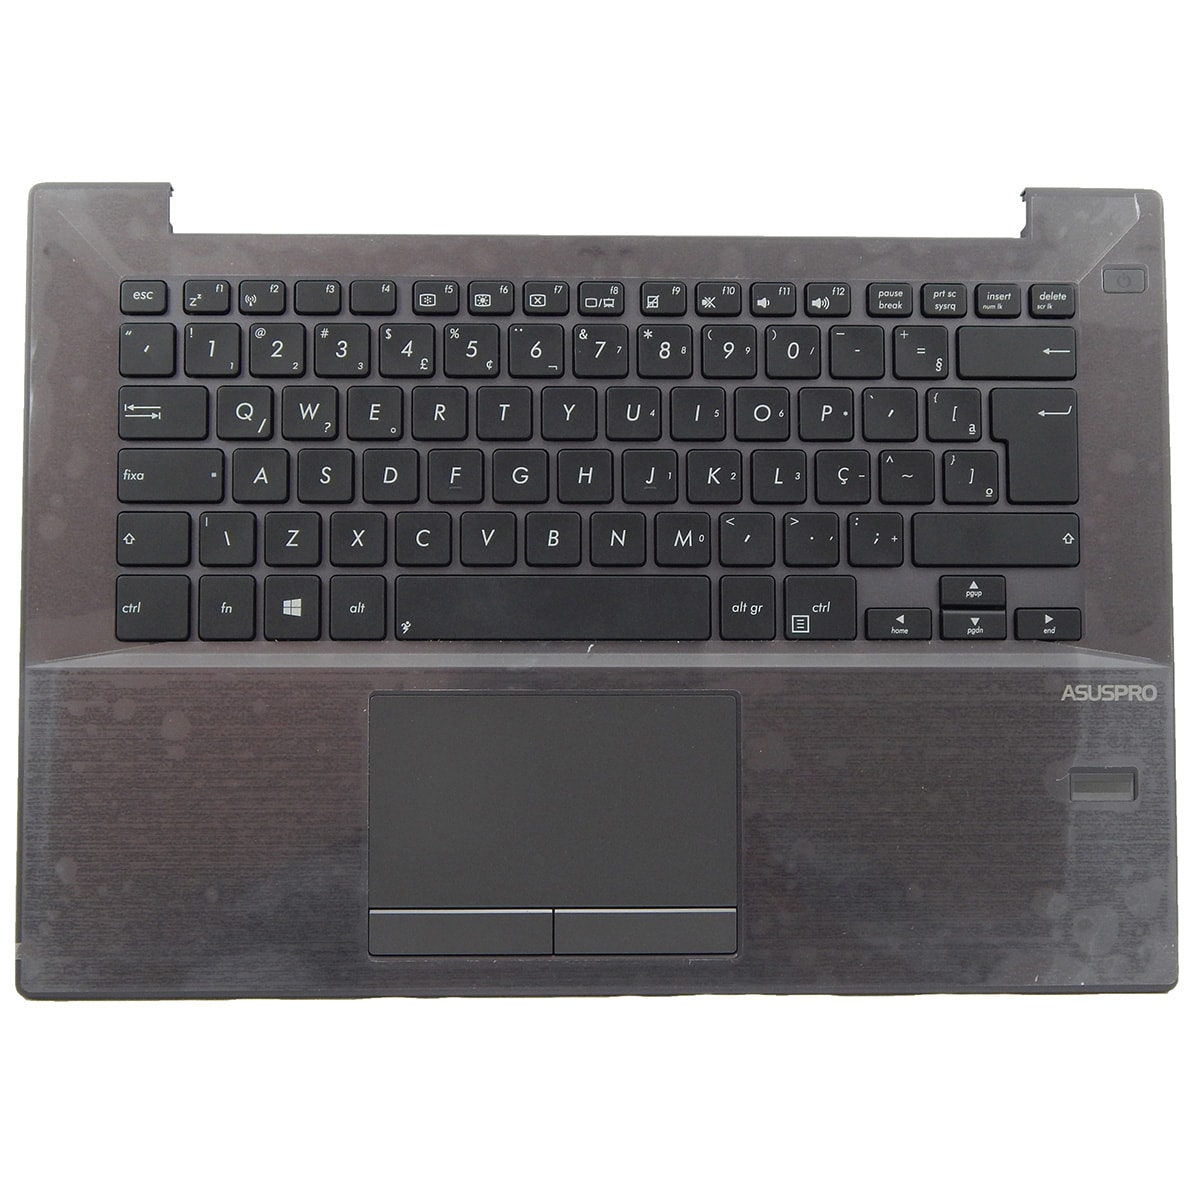 Teclado Notebook Asus BU400v c/ Moldura Preto c/ Touch Pn: MP-12C76PA-6920W / AENJ9600010